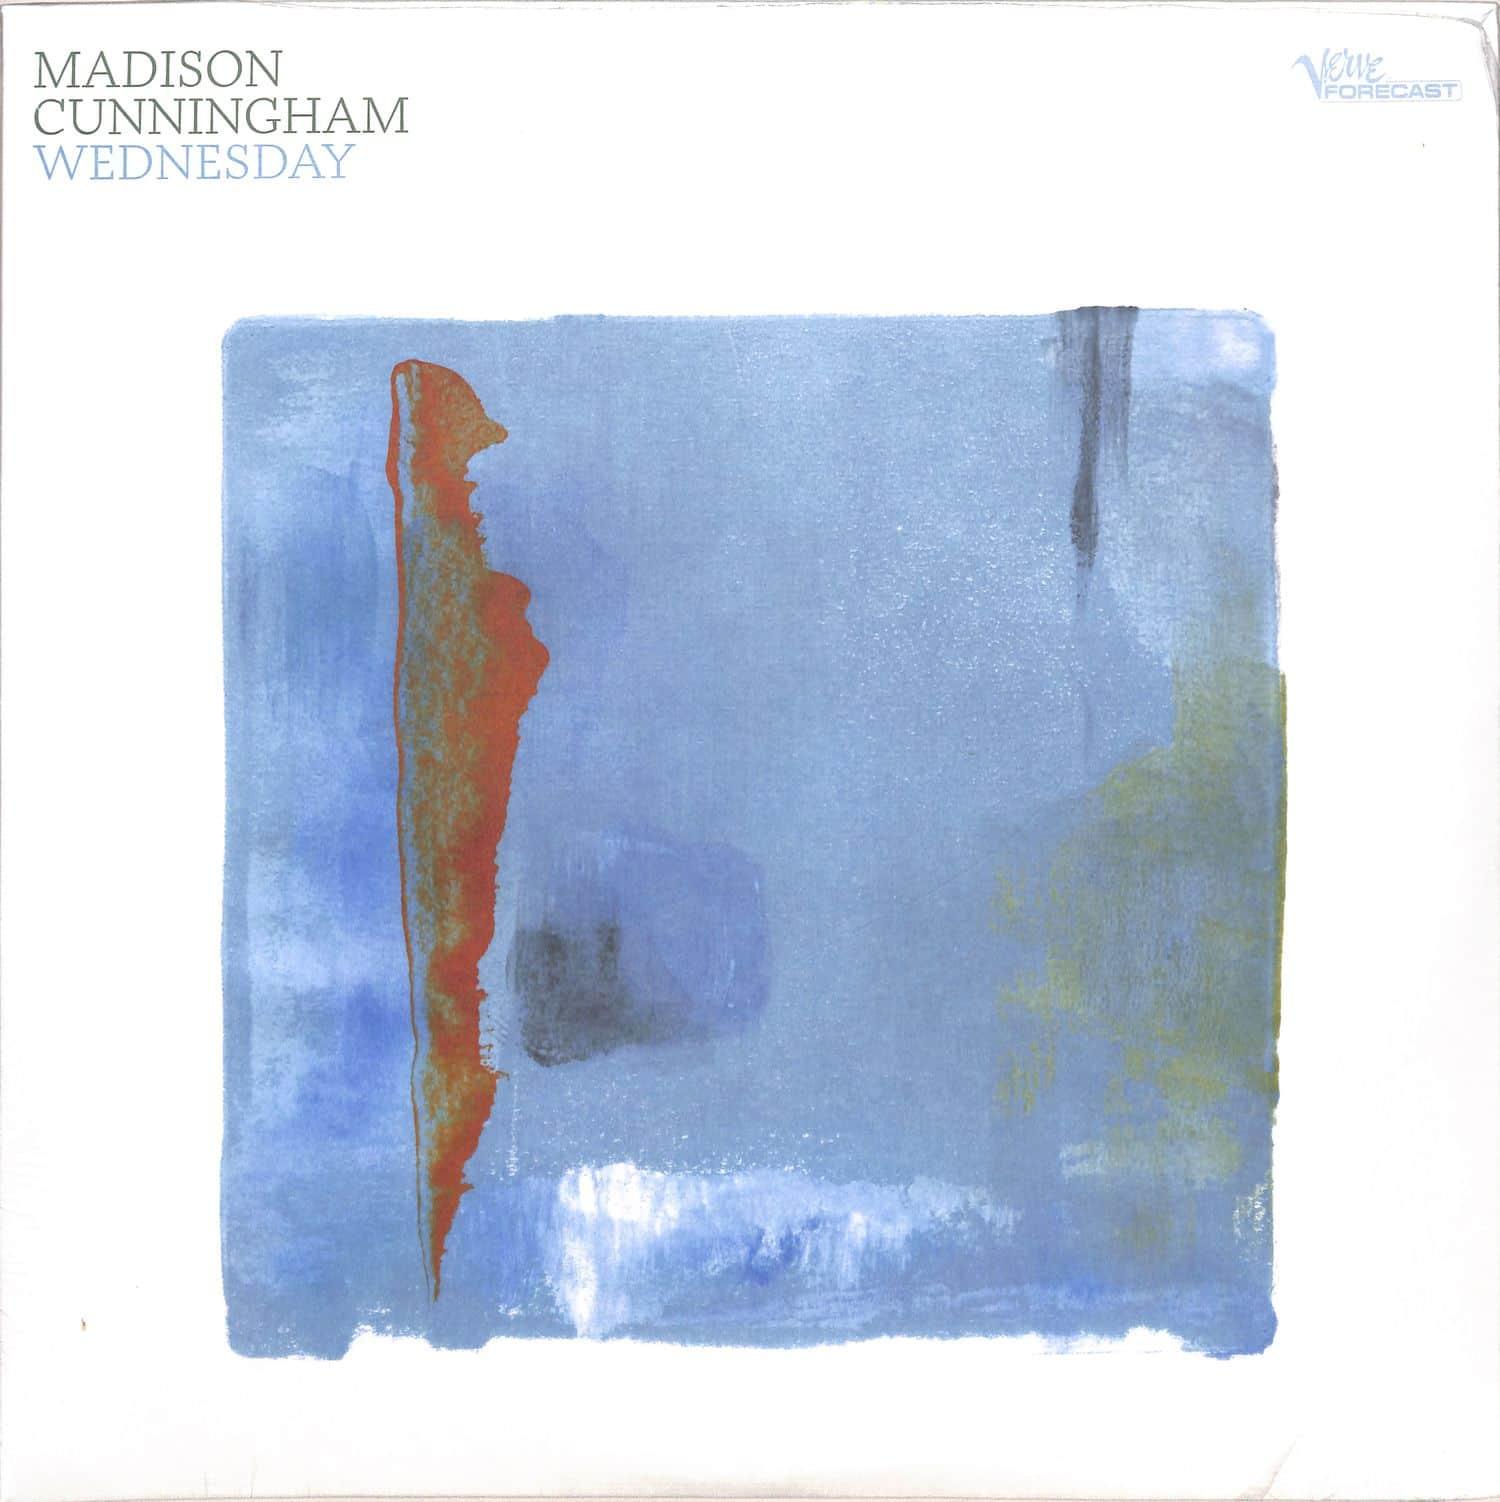 Madison Cunningham - WEDNESDAY